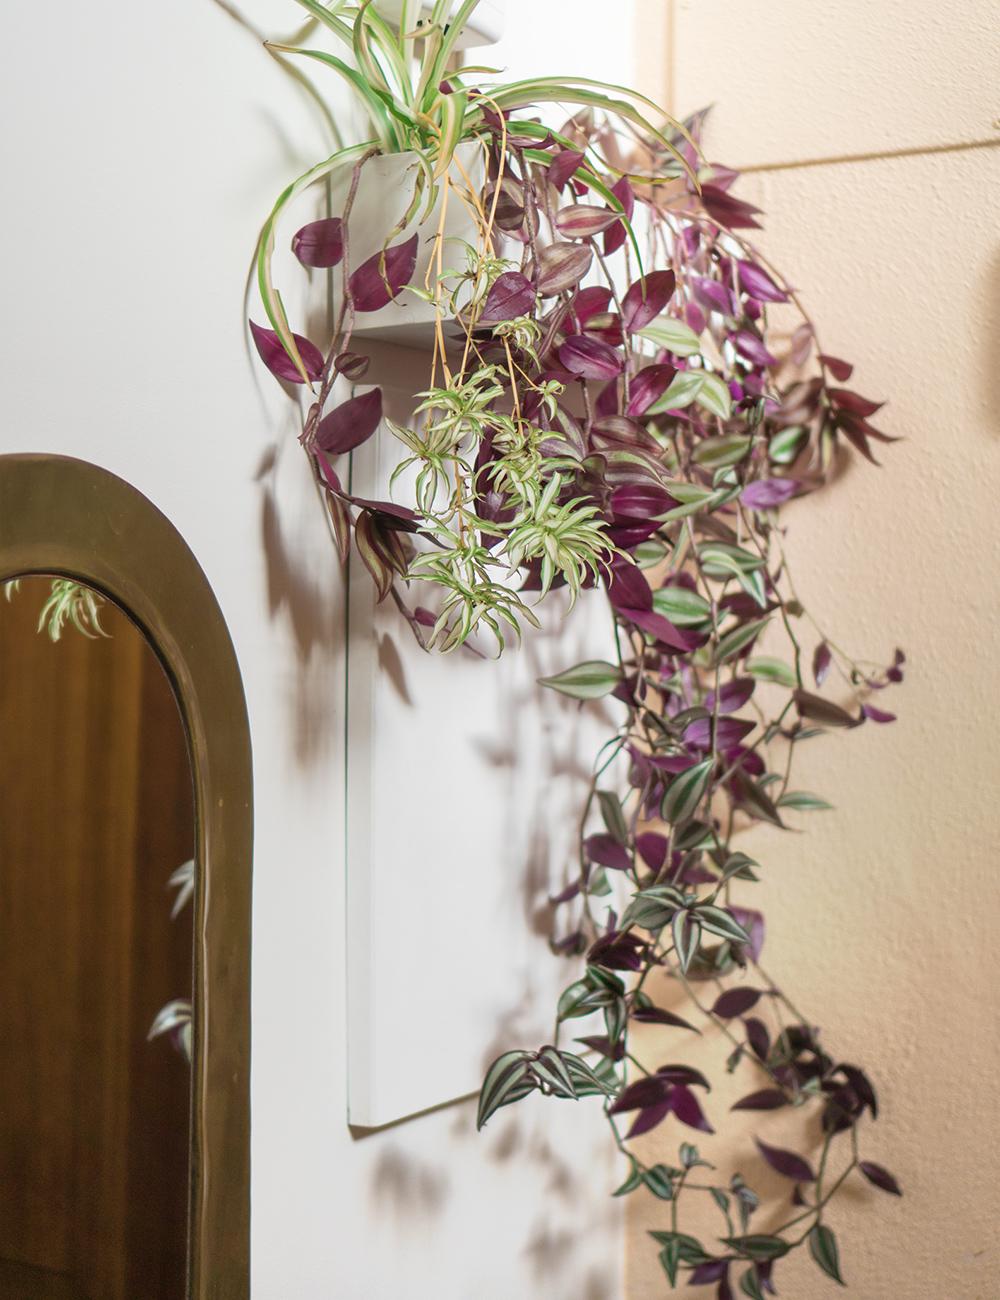 Jardinera colgante DIY, visto en